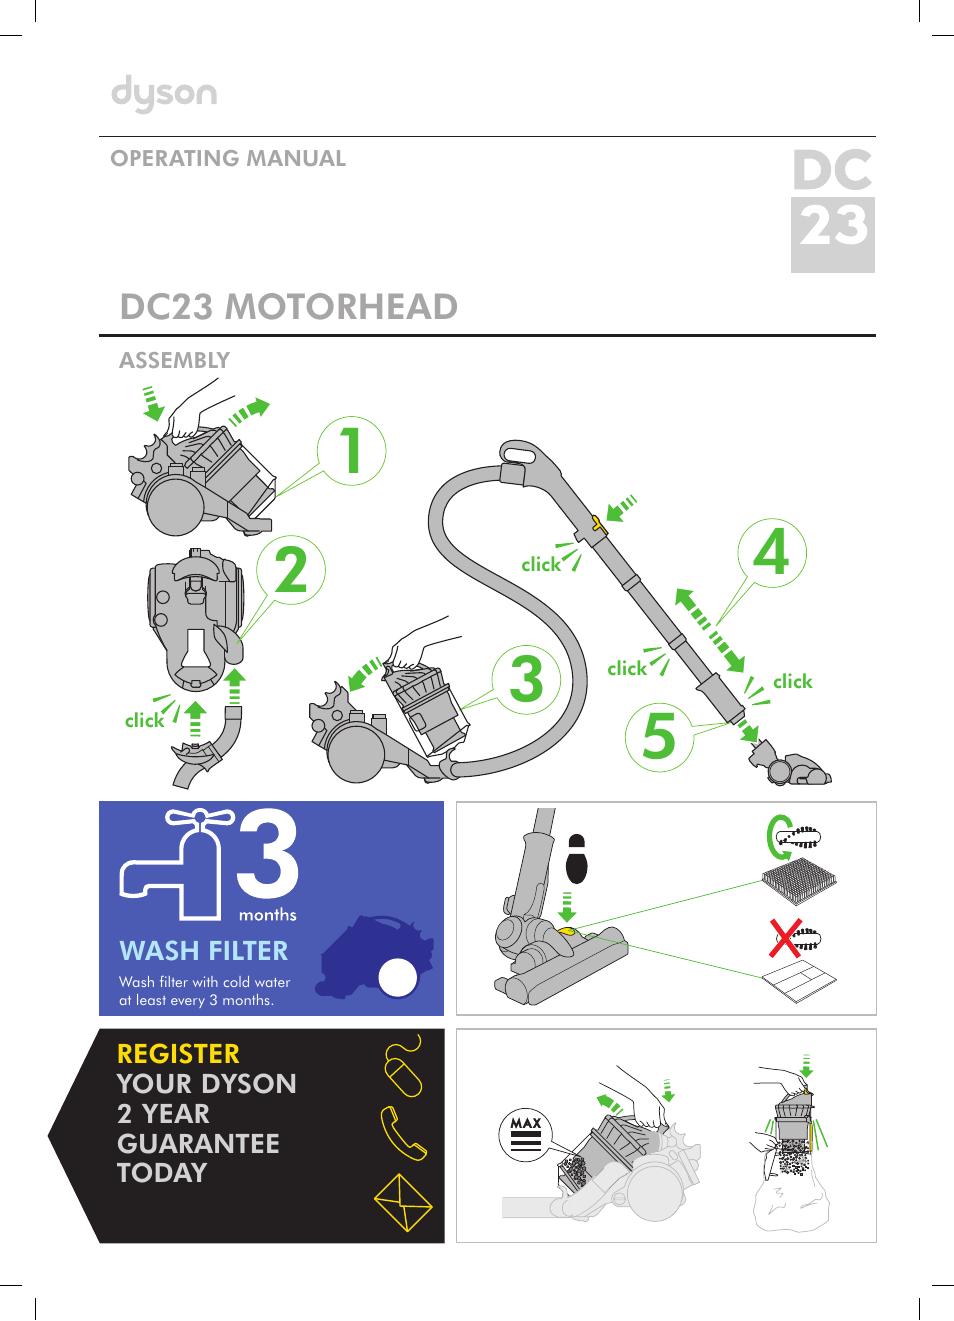 dyson dc23 user manual 12 pages rh manualsdir com Dyson Vacuum Cleaner User Manual Dyson Vacuum Cleaner User Manual